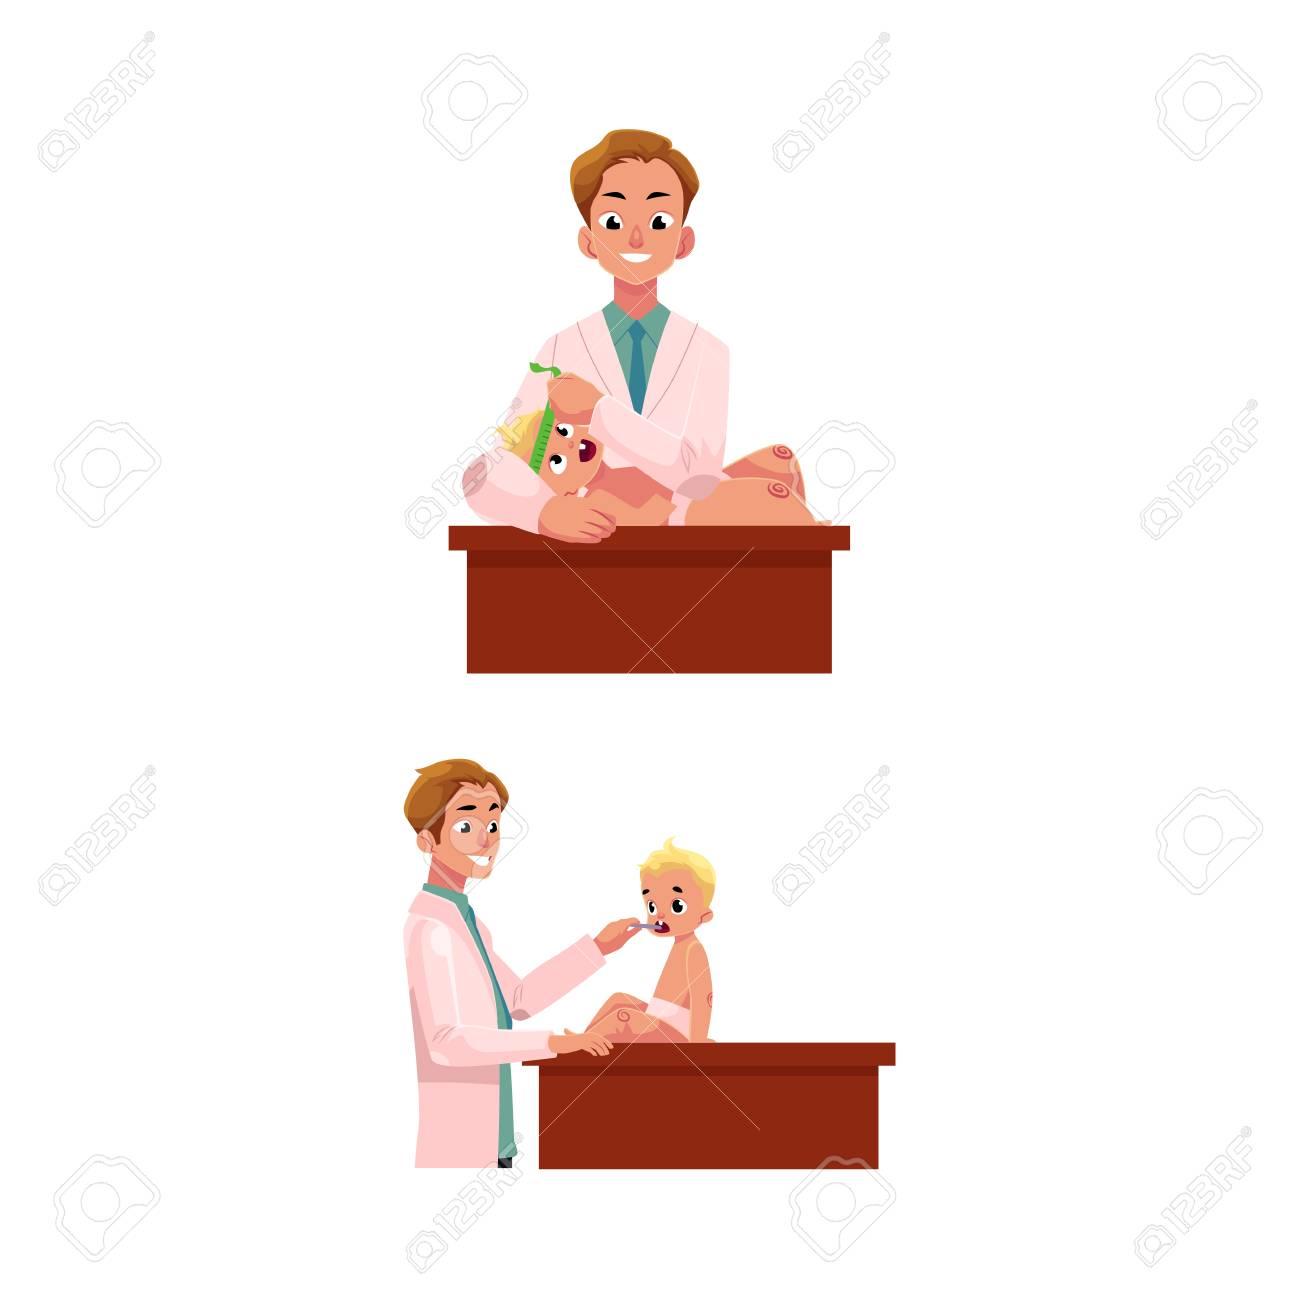 2f05a90a5 Man Doctor